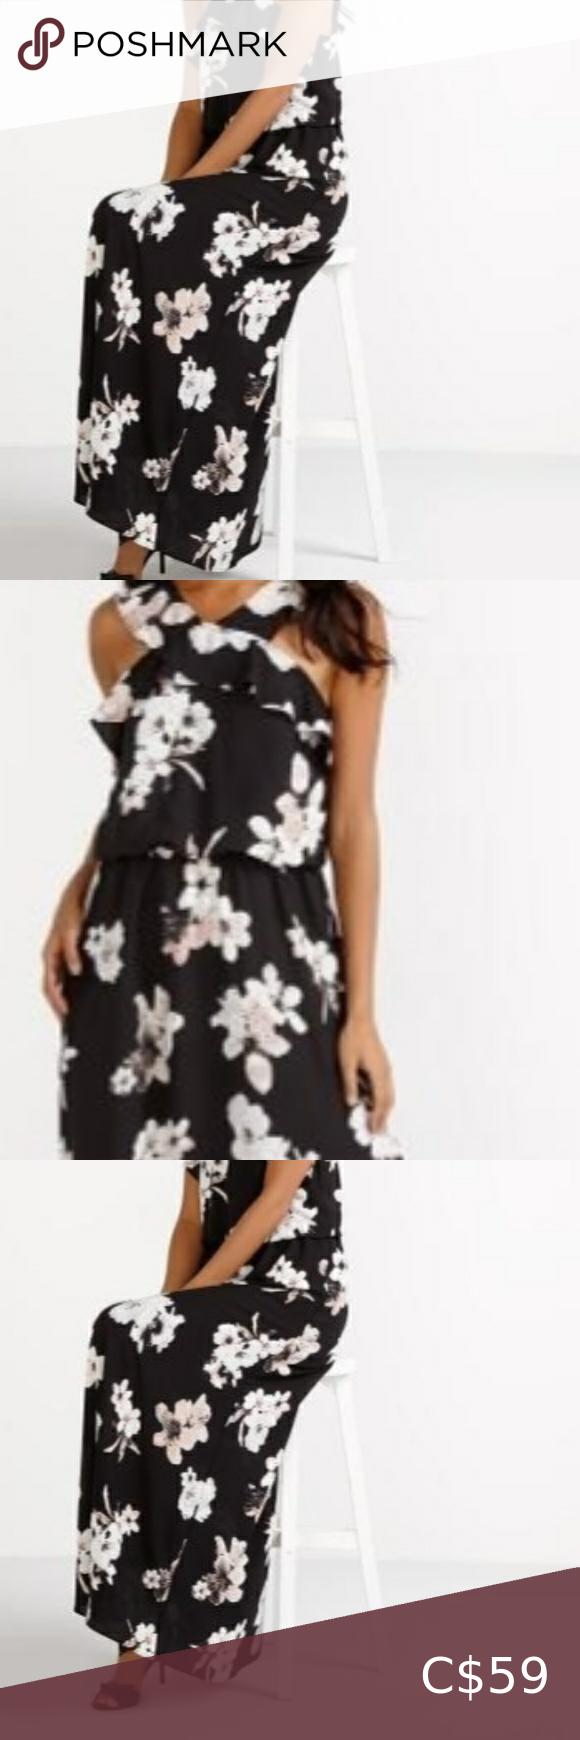 2 60 Reitman S 10 Black Flower Dress Nwt Black Flower Dress Reitmans Dresses Floral Print Maxi Dress [ 1740 x 580 Pixel ]